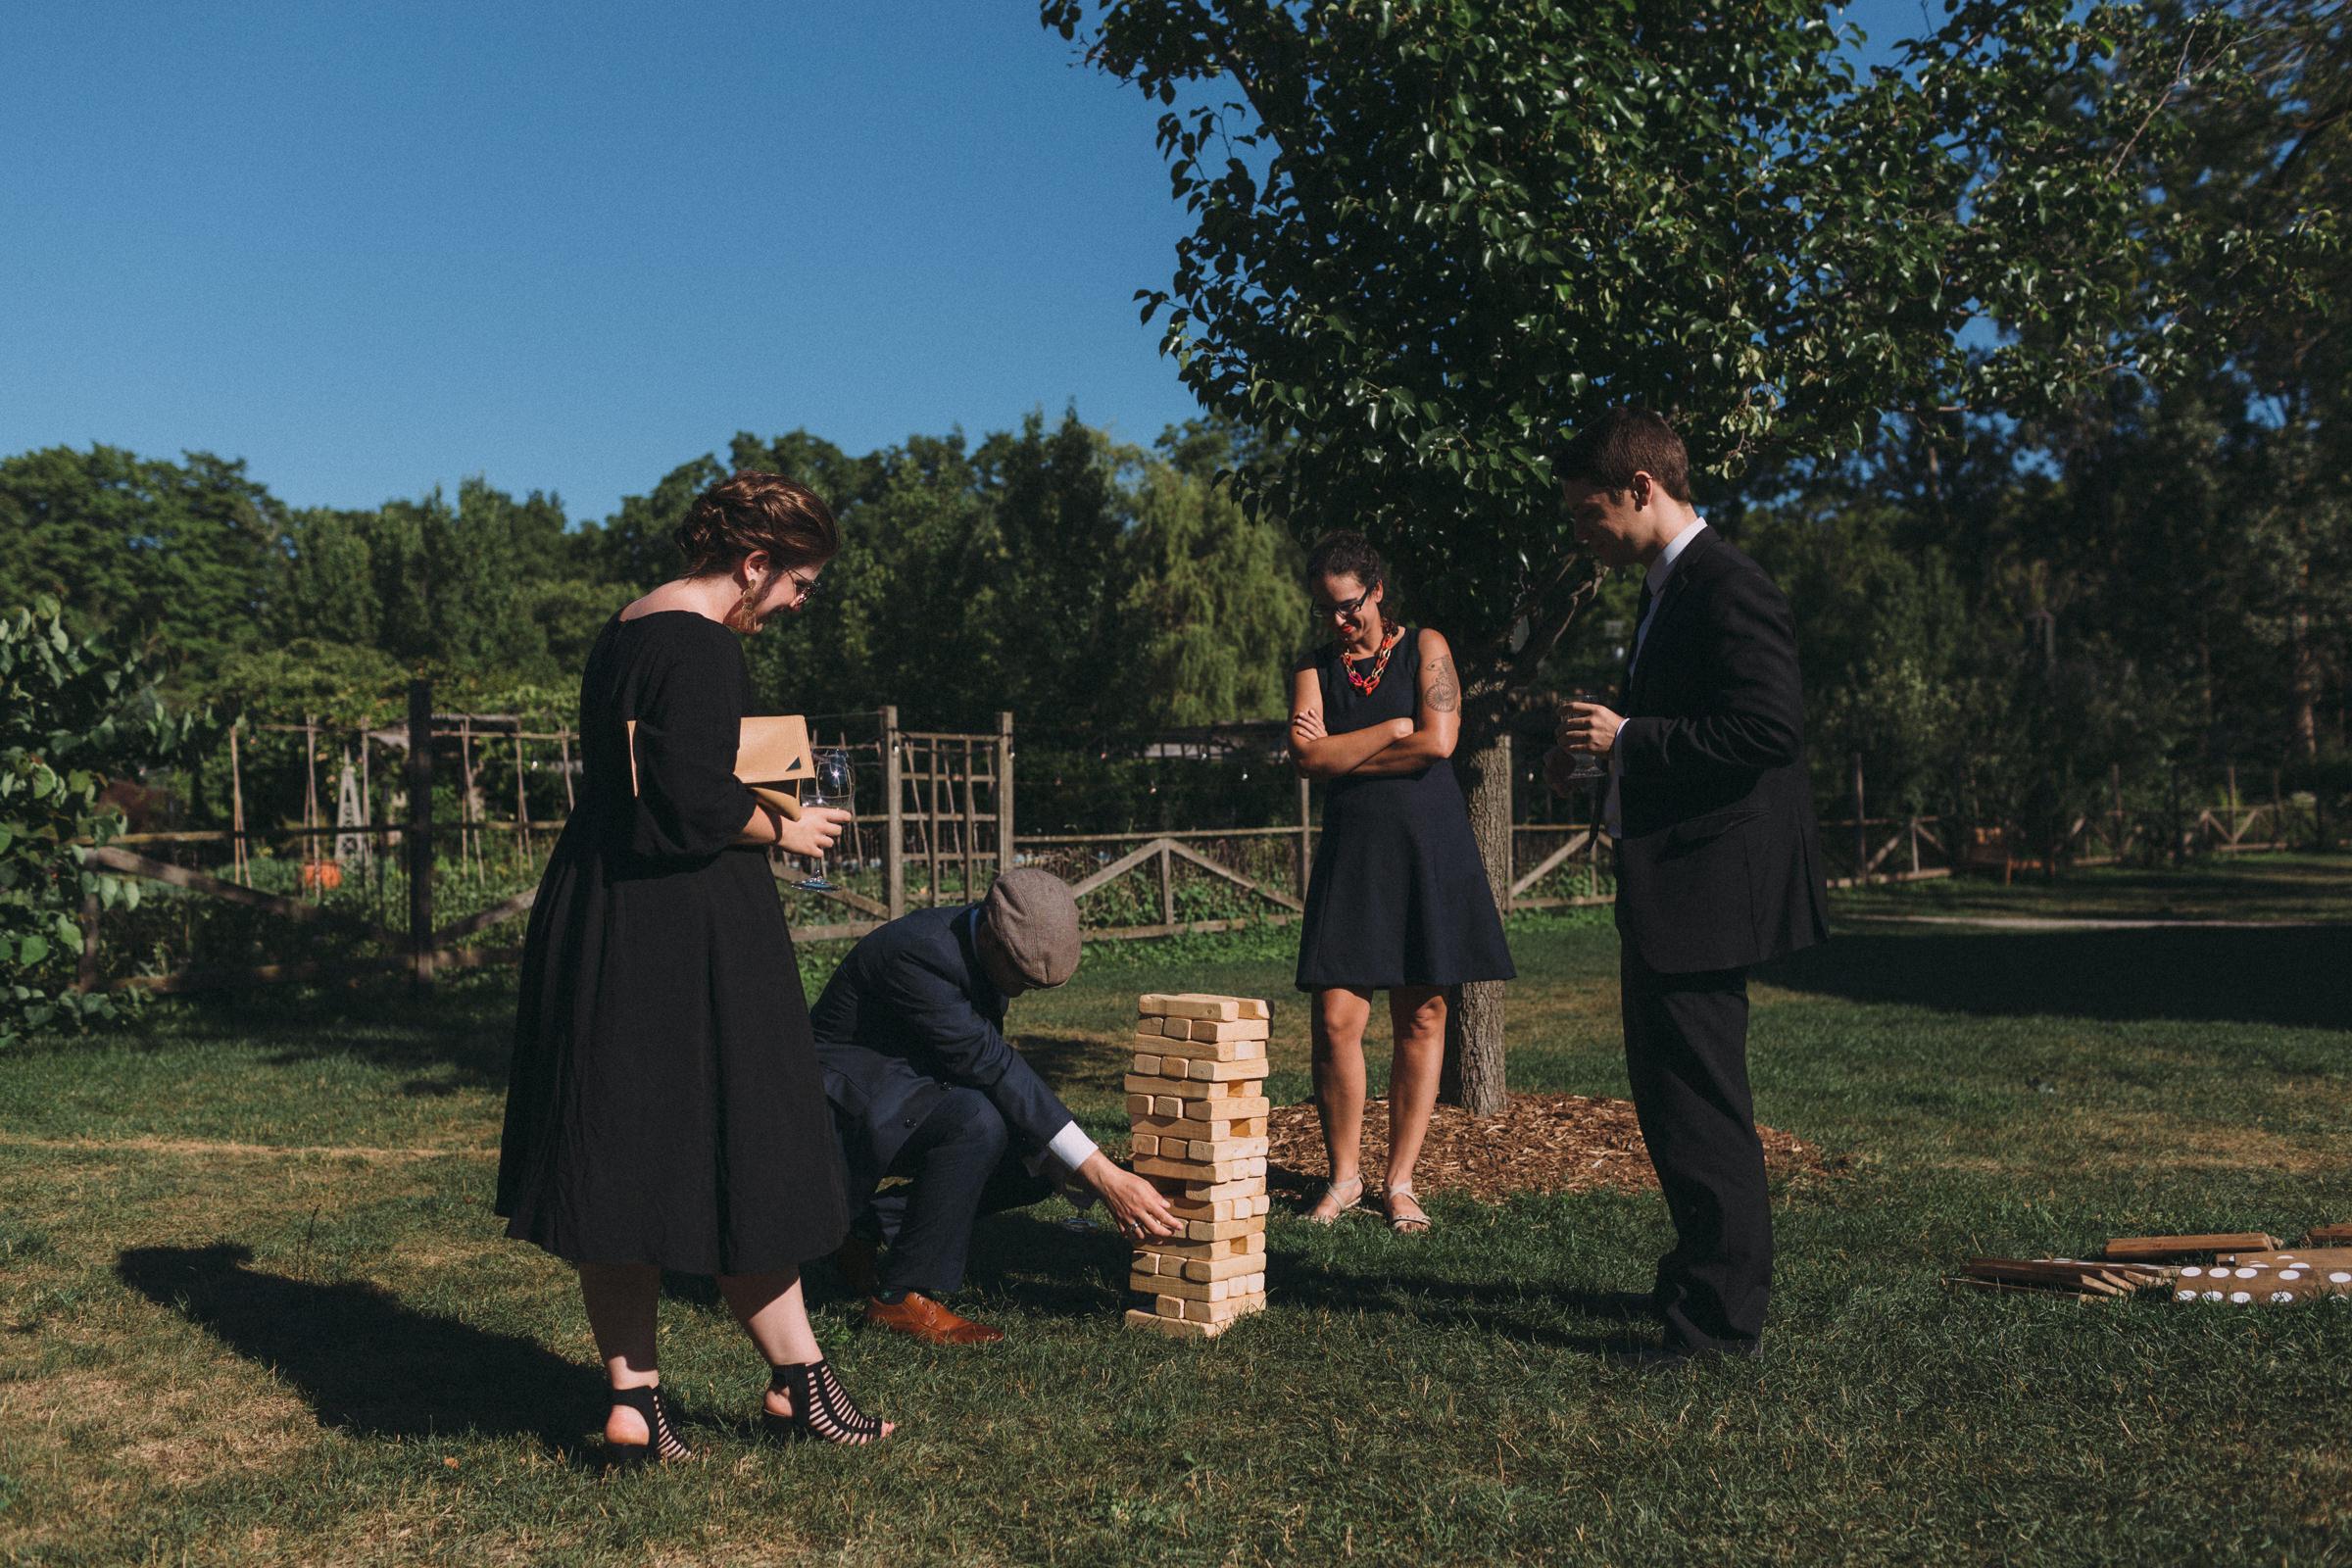 Langdon-Hall-wedding-photography-Cambridge-by-Sam-Wong-of-Visual-Cravings_Sarah-Ryan_40.jpg